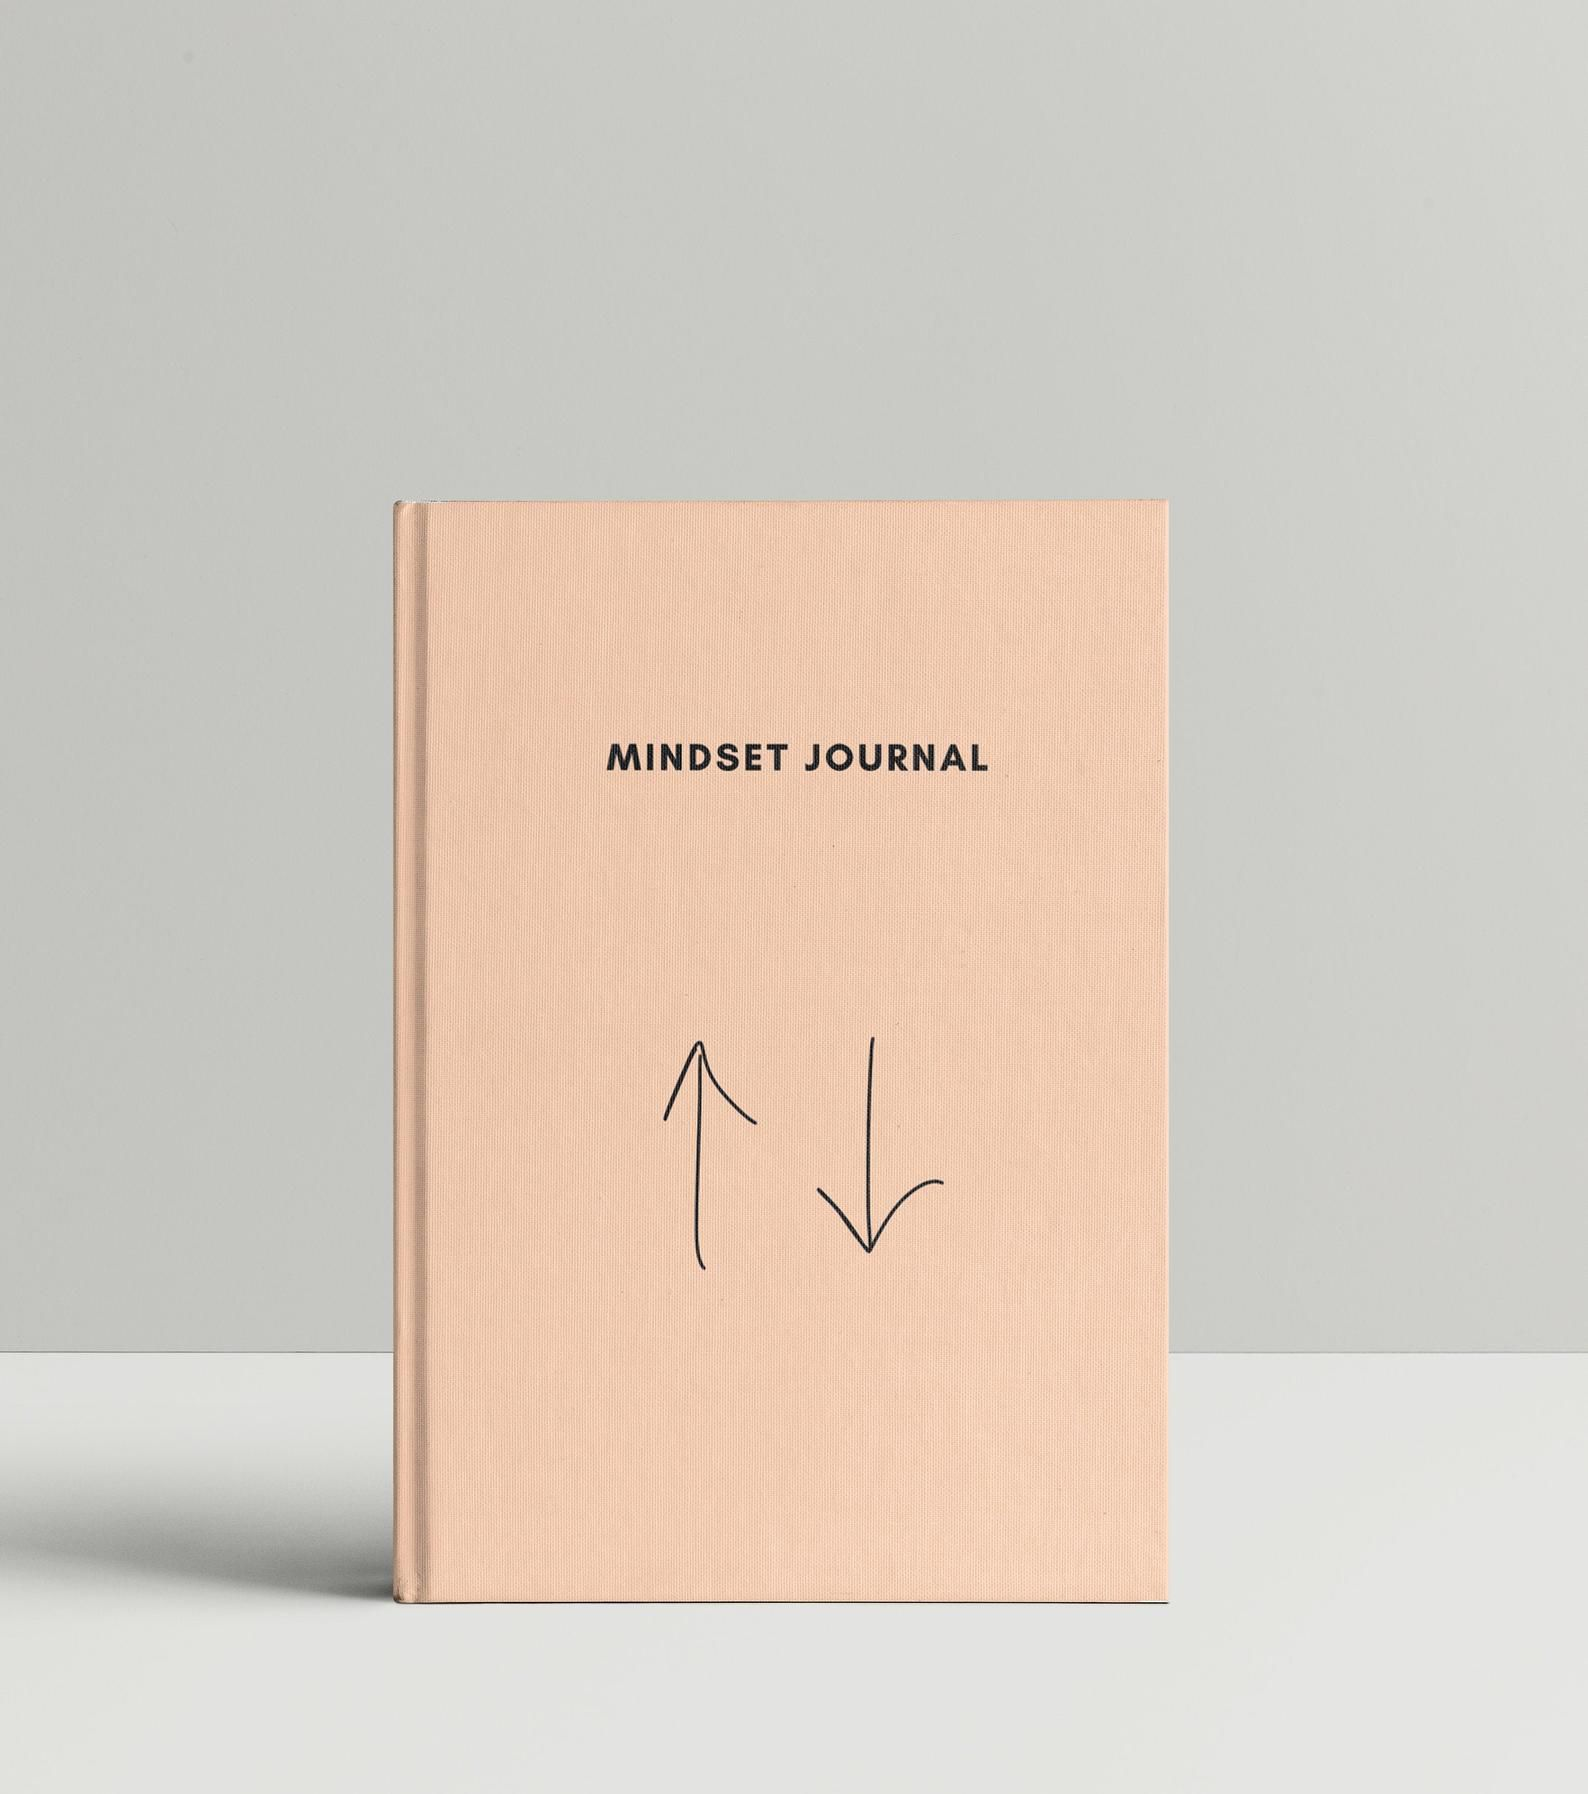 Etsy Mindset Journal